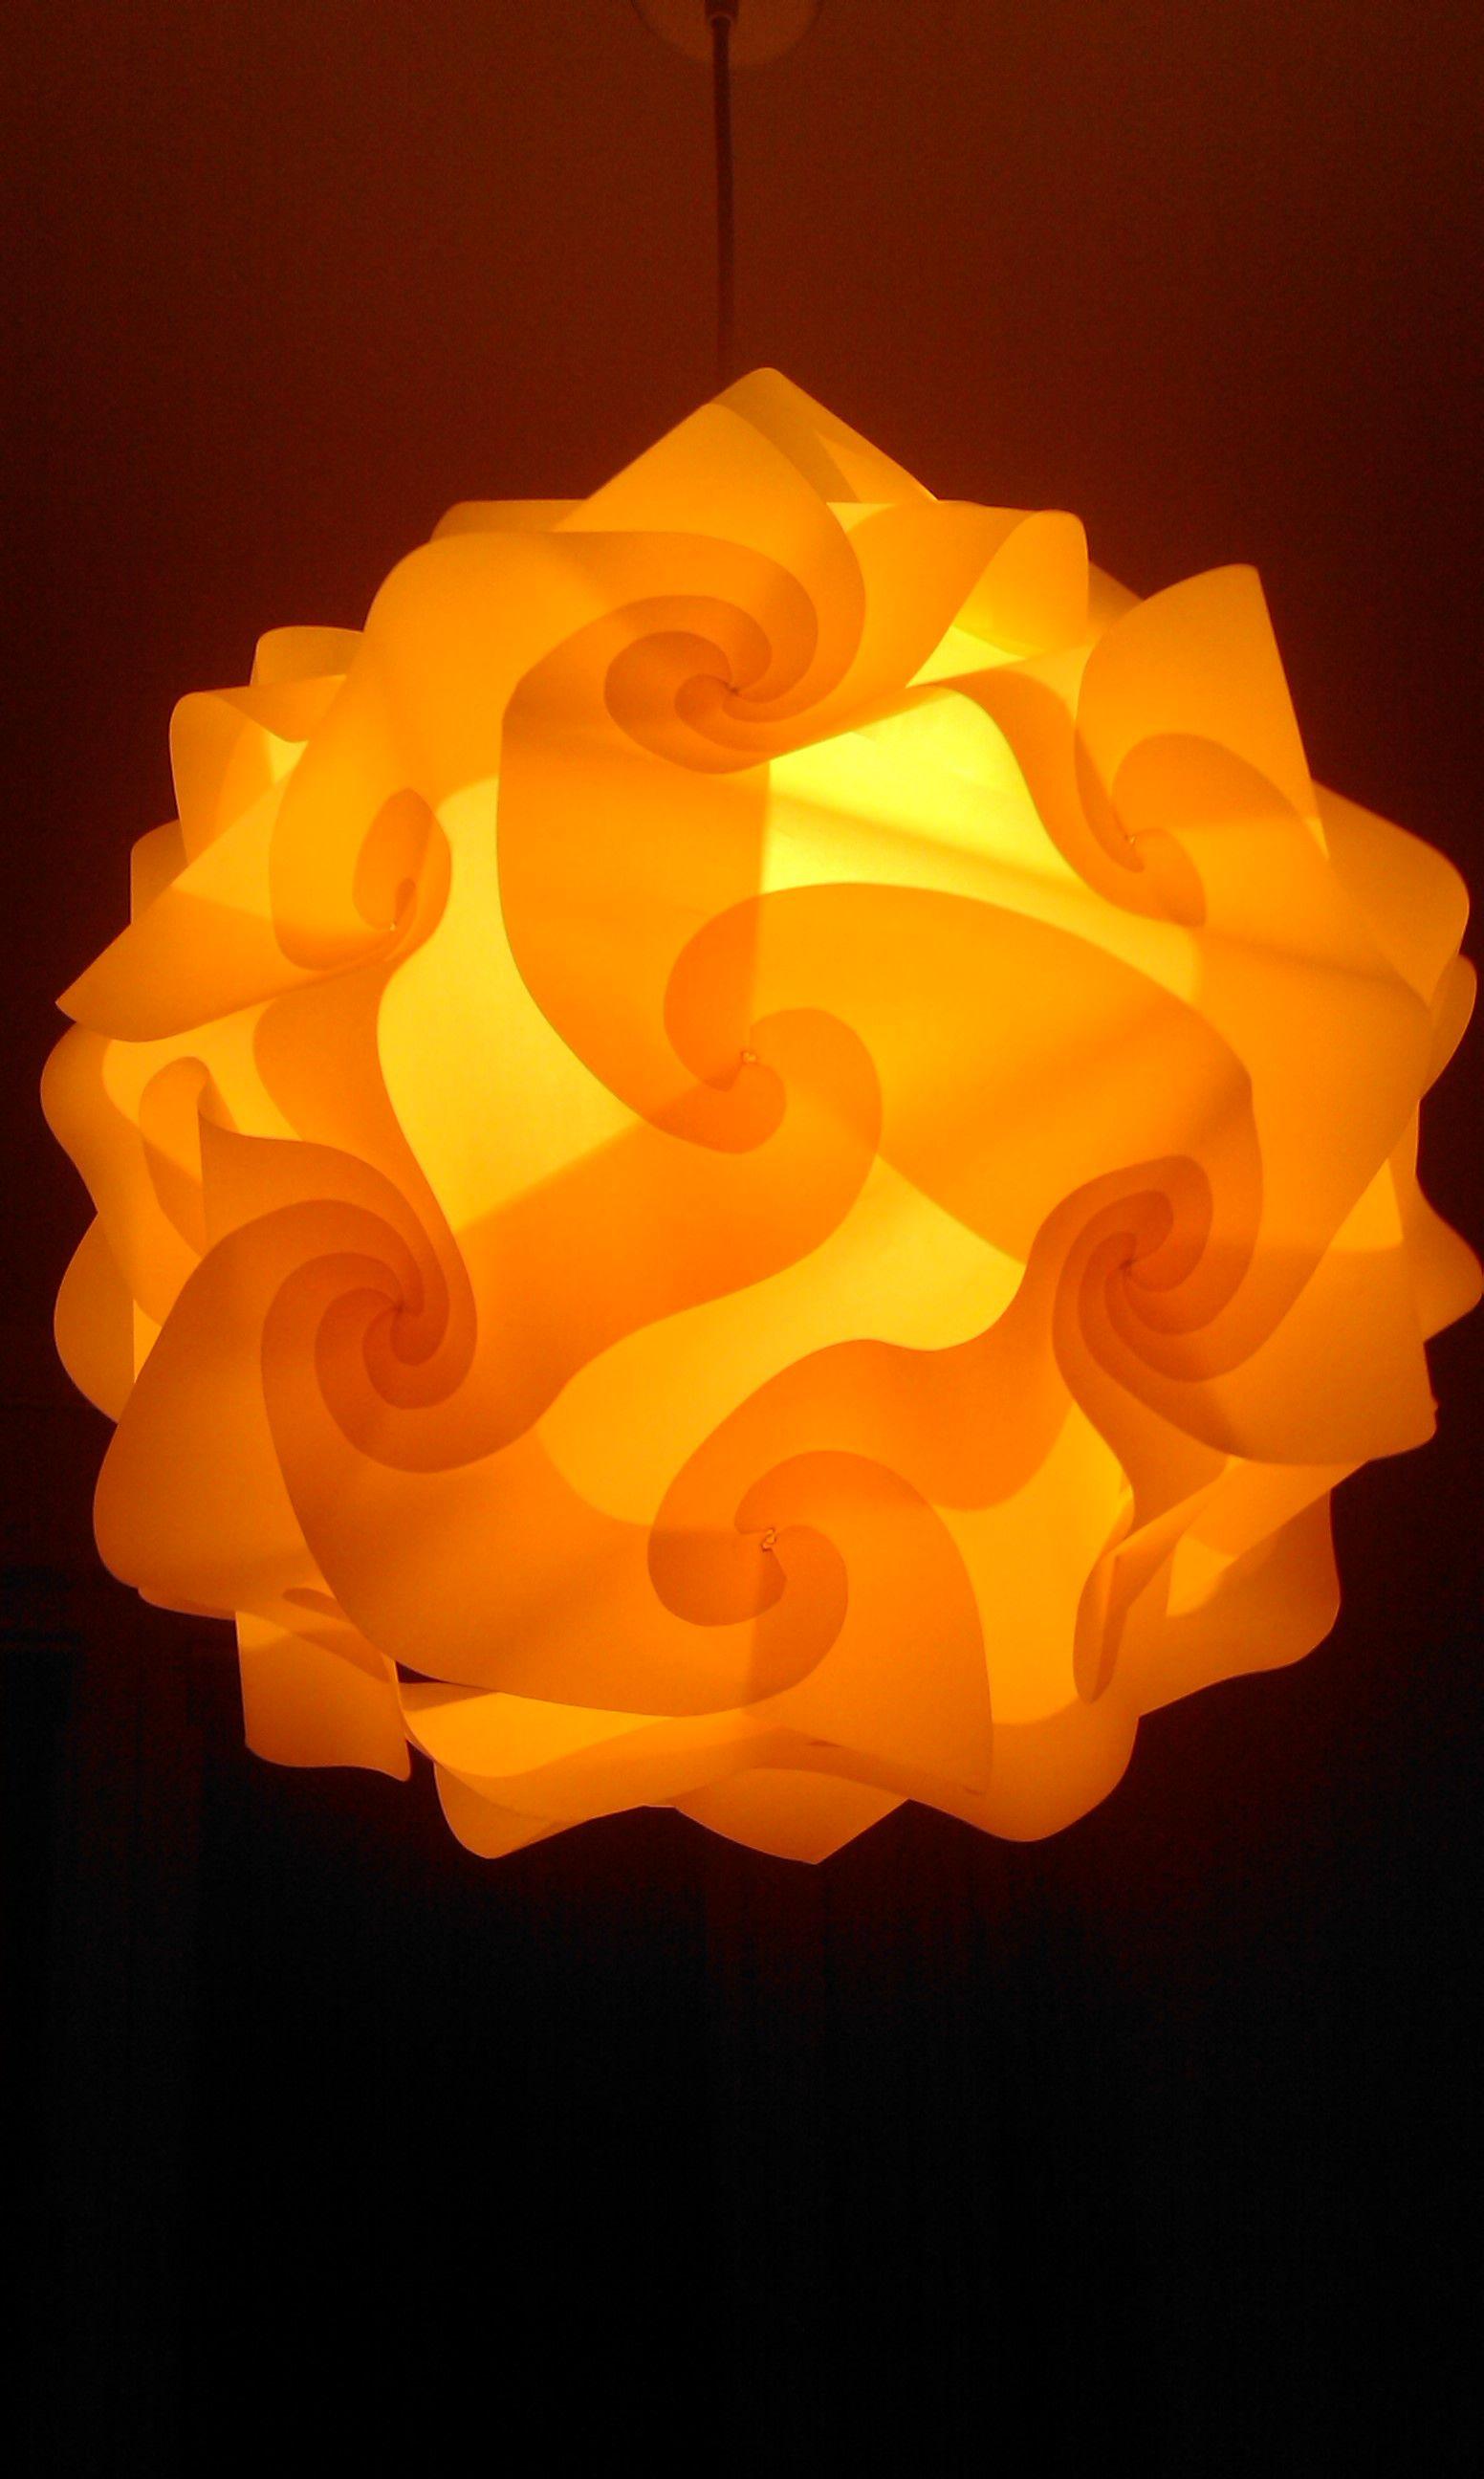 lampe aus papier bauanleitung zum selber bauen heimwerker forum lampen basteln lampen. Black Bedroom Furniture Sets. Home Design Ideas